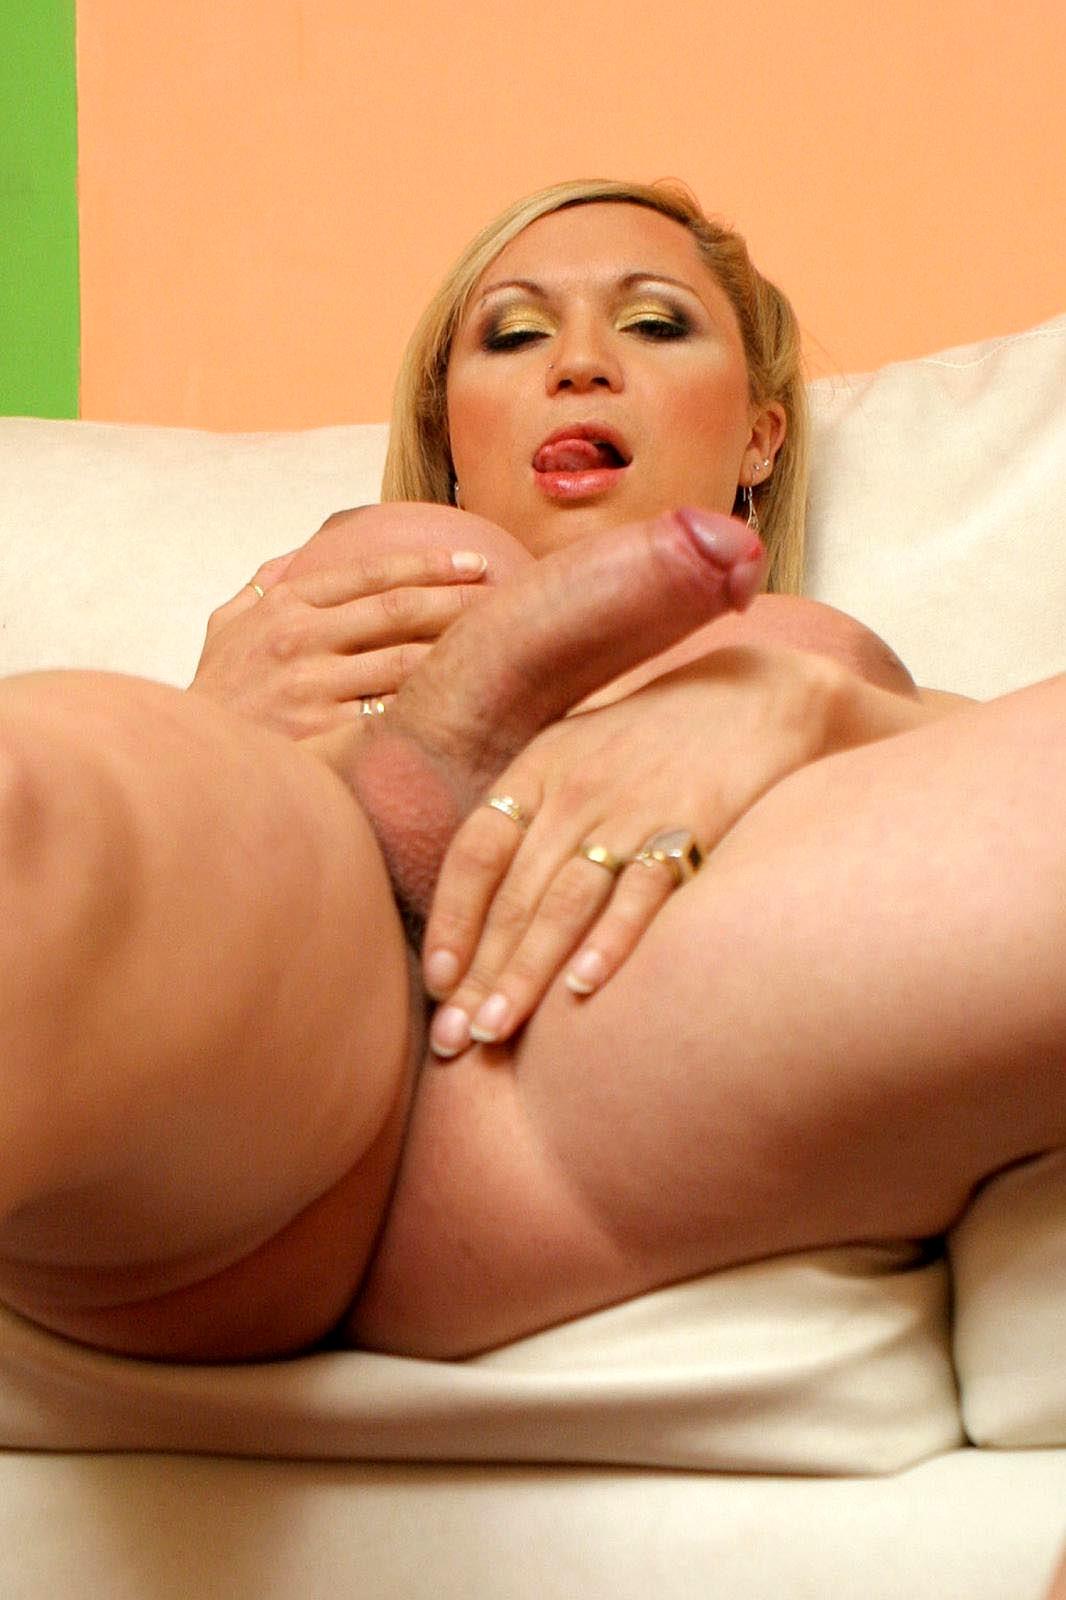 Curvy Tranny Karen Visconti Getting Her T-Girl Penis Tease